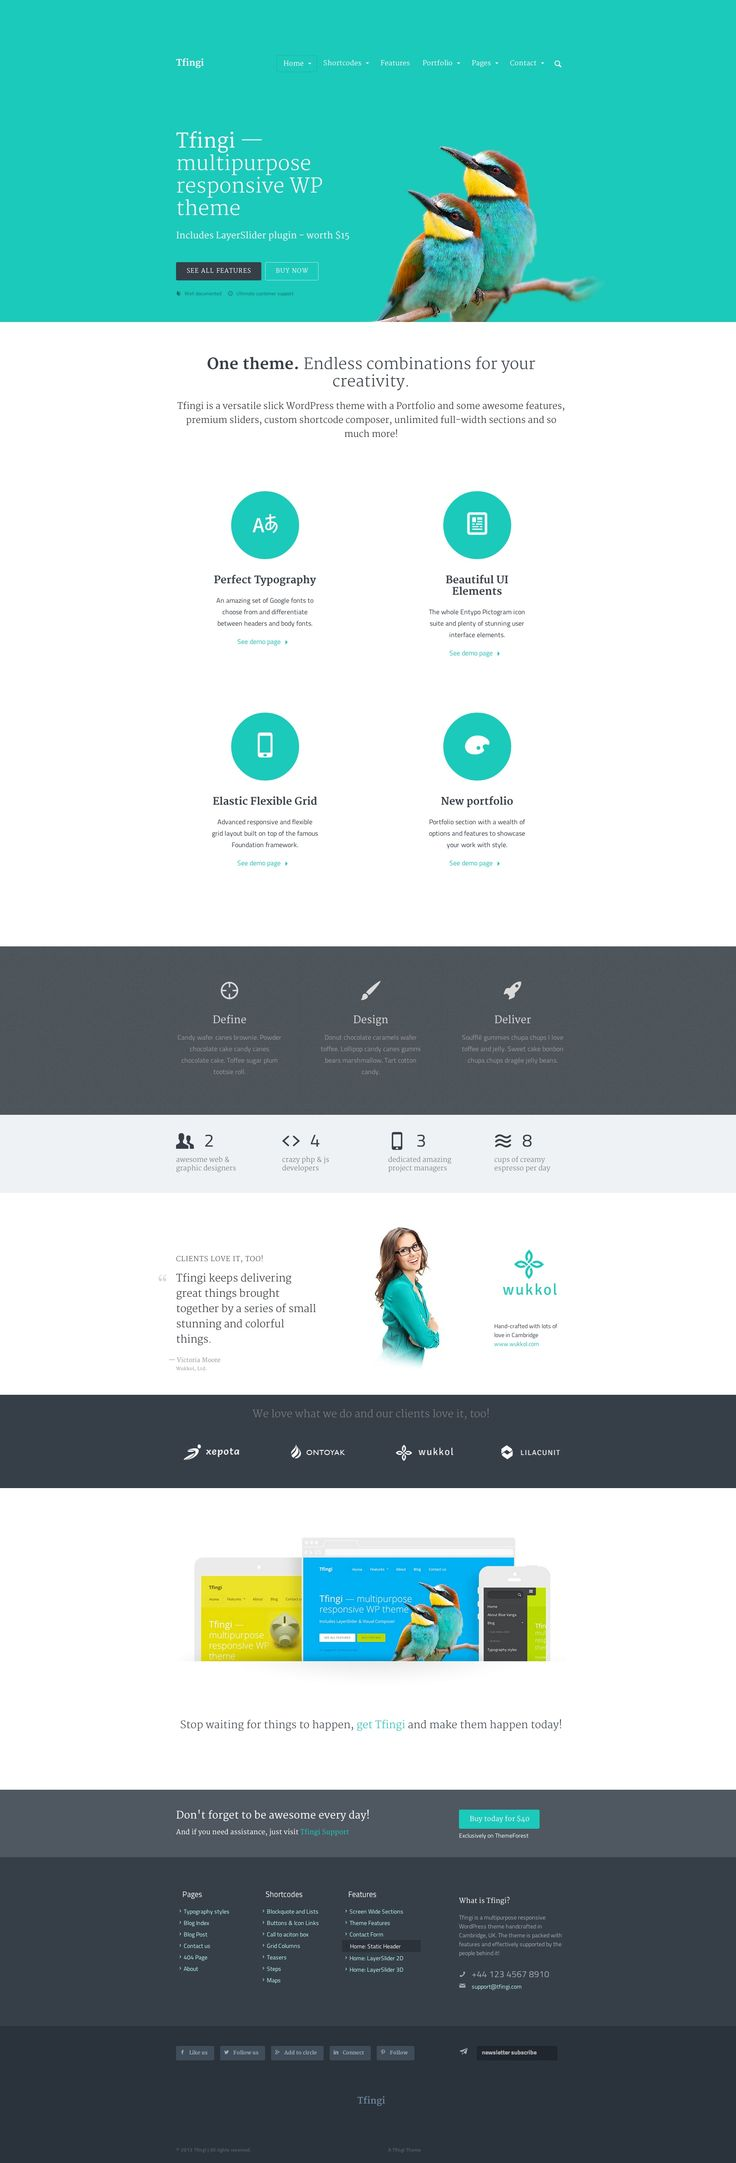 Awesome css designs - Tfingi Responsive Multipurpose Wordpress Theme Wordpress Theme Template Webdesign Webpage Website Site Design Html Css Blog Responsive Mobile